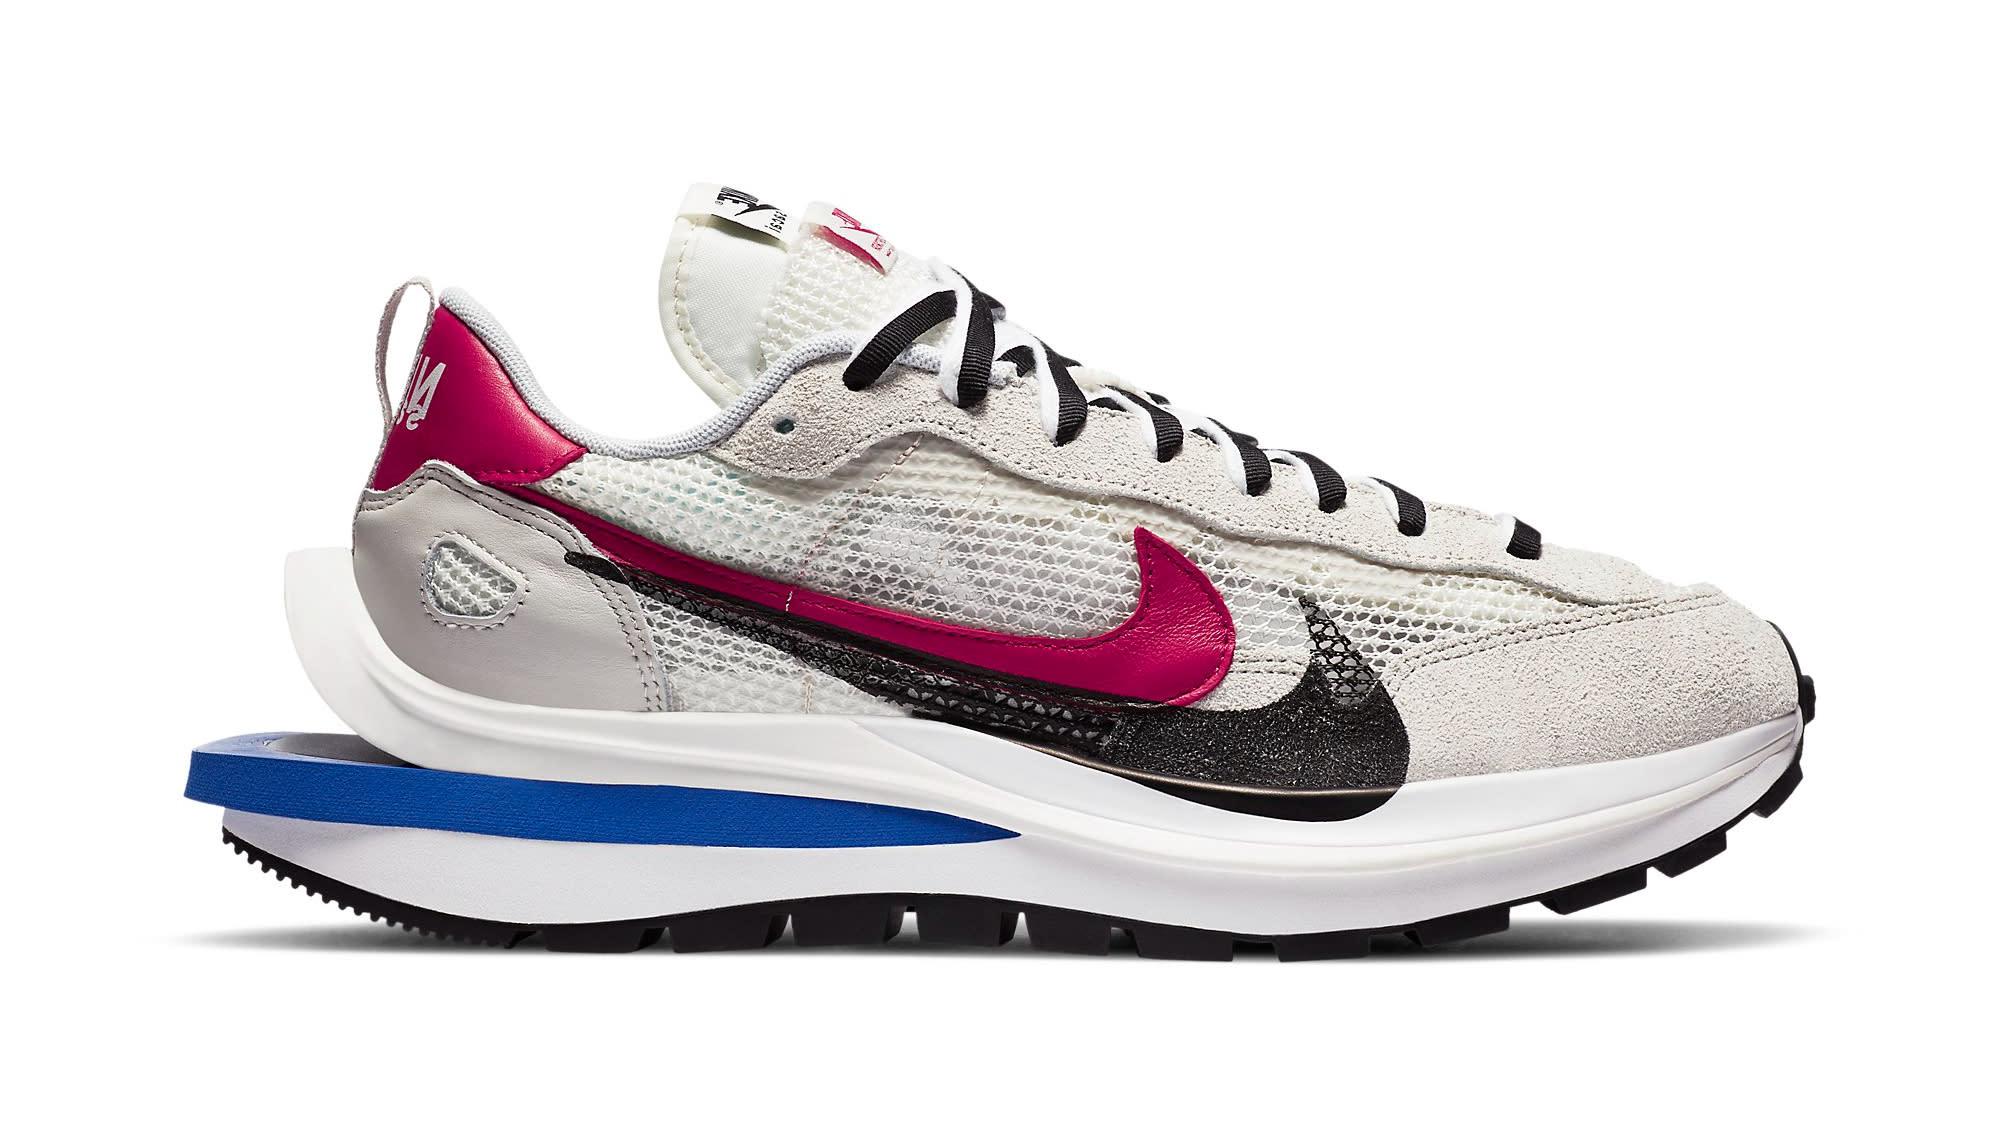 Sacai x Nike VaporWaffle 'Sail' CV1363-100 Release Date